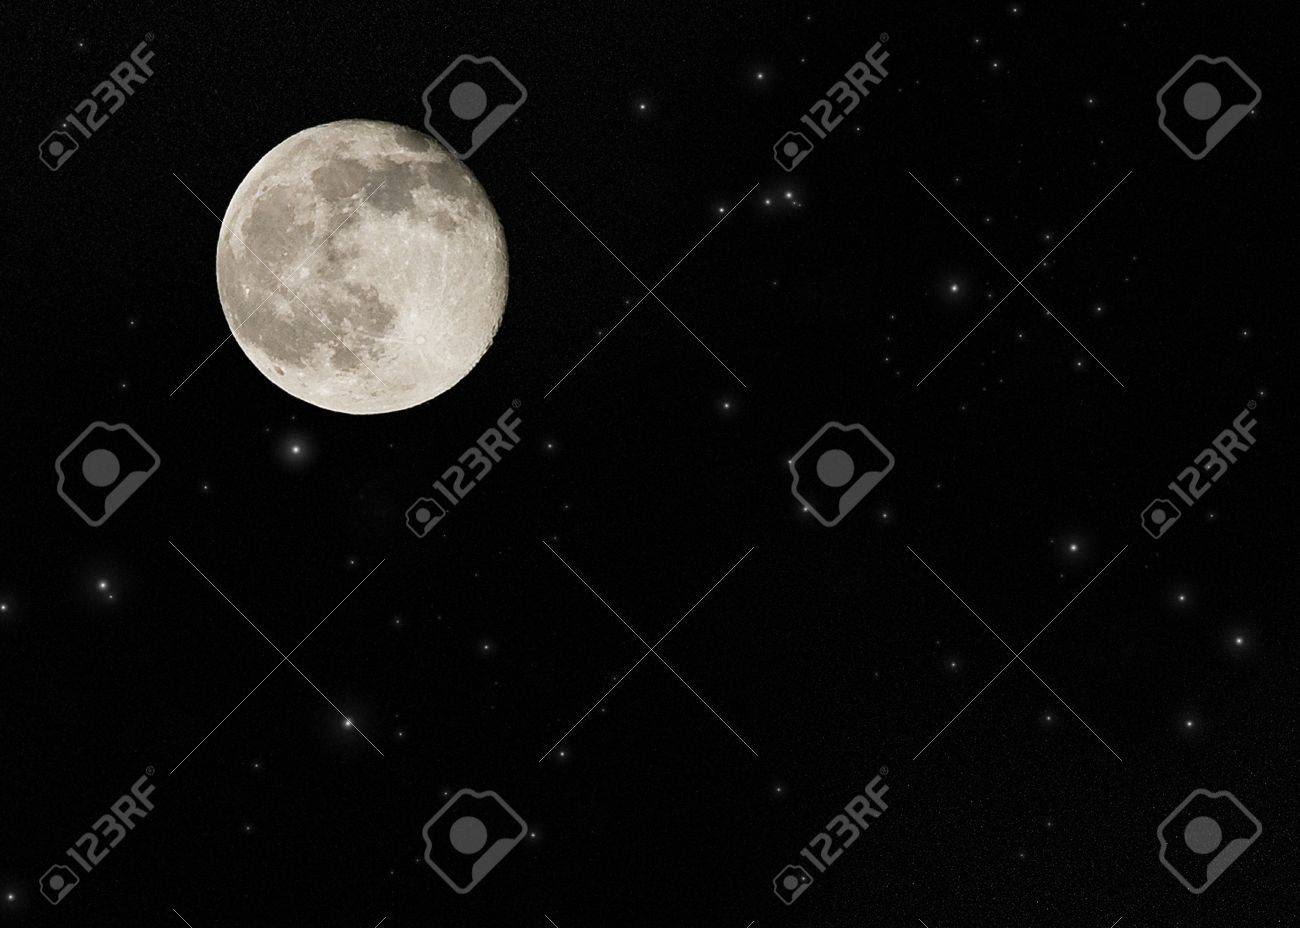 Near full moon on a large star field Stock Photo - 4358643